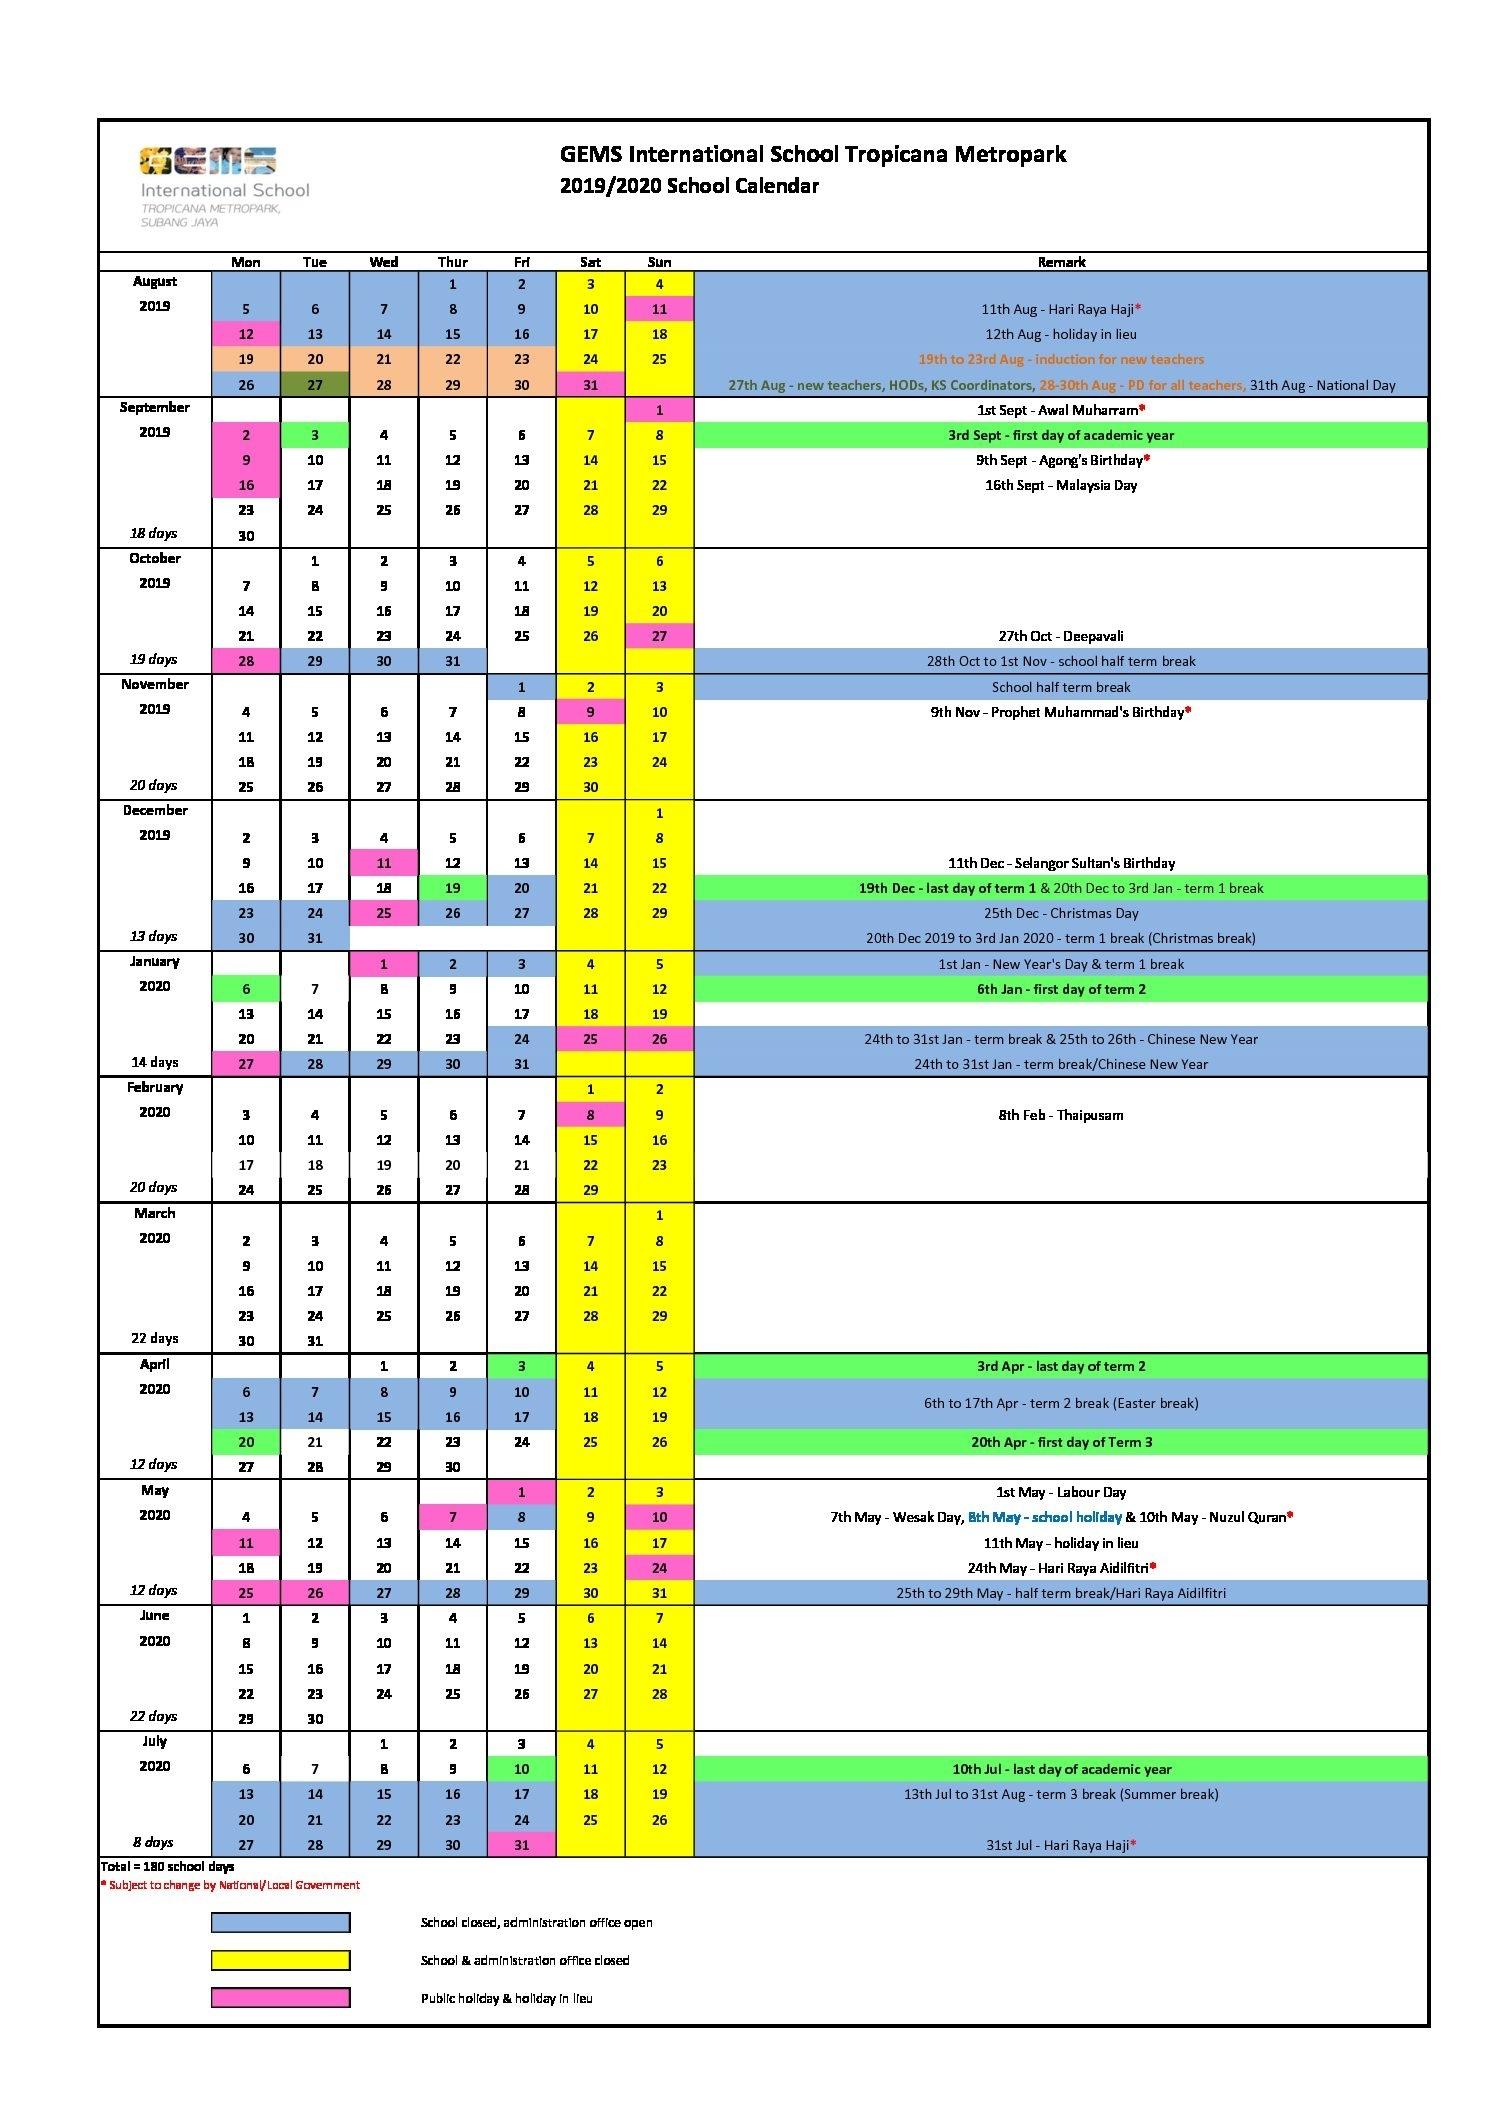 2019/2020 School Calendar - Gems International School Metropark Remarkable Calendar 2020 Malaysia With School Holiday